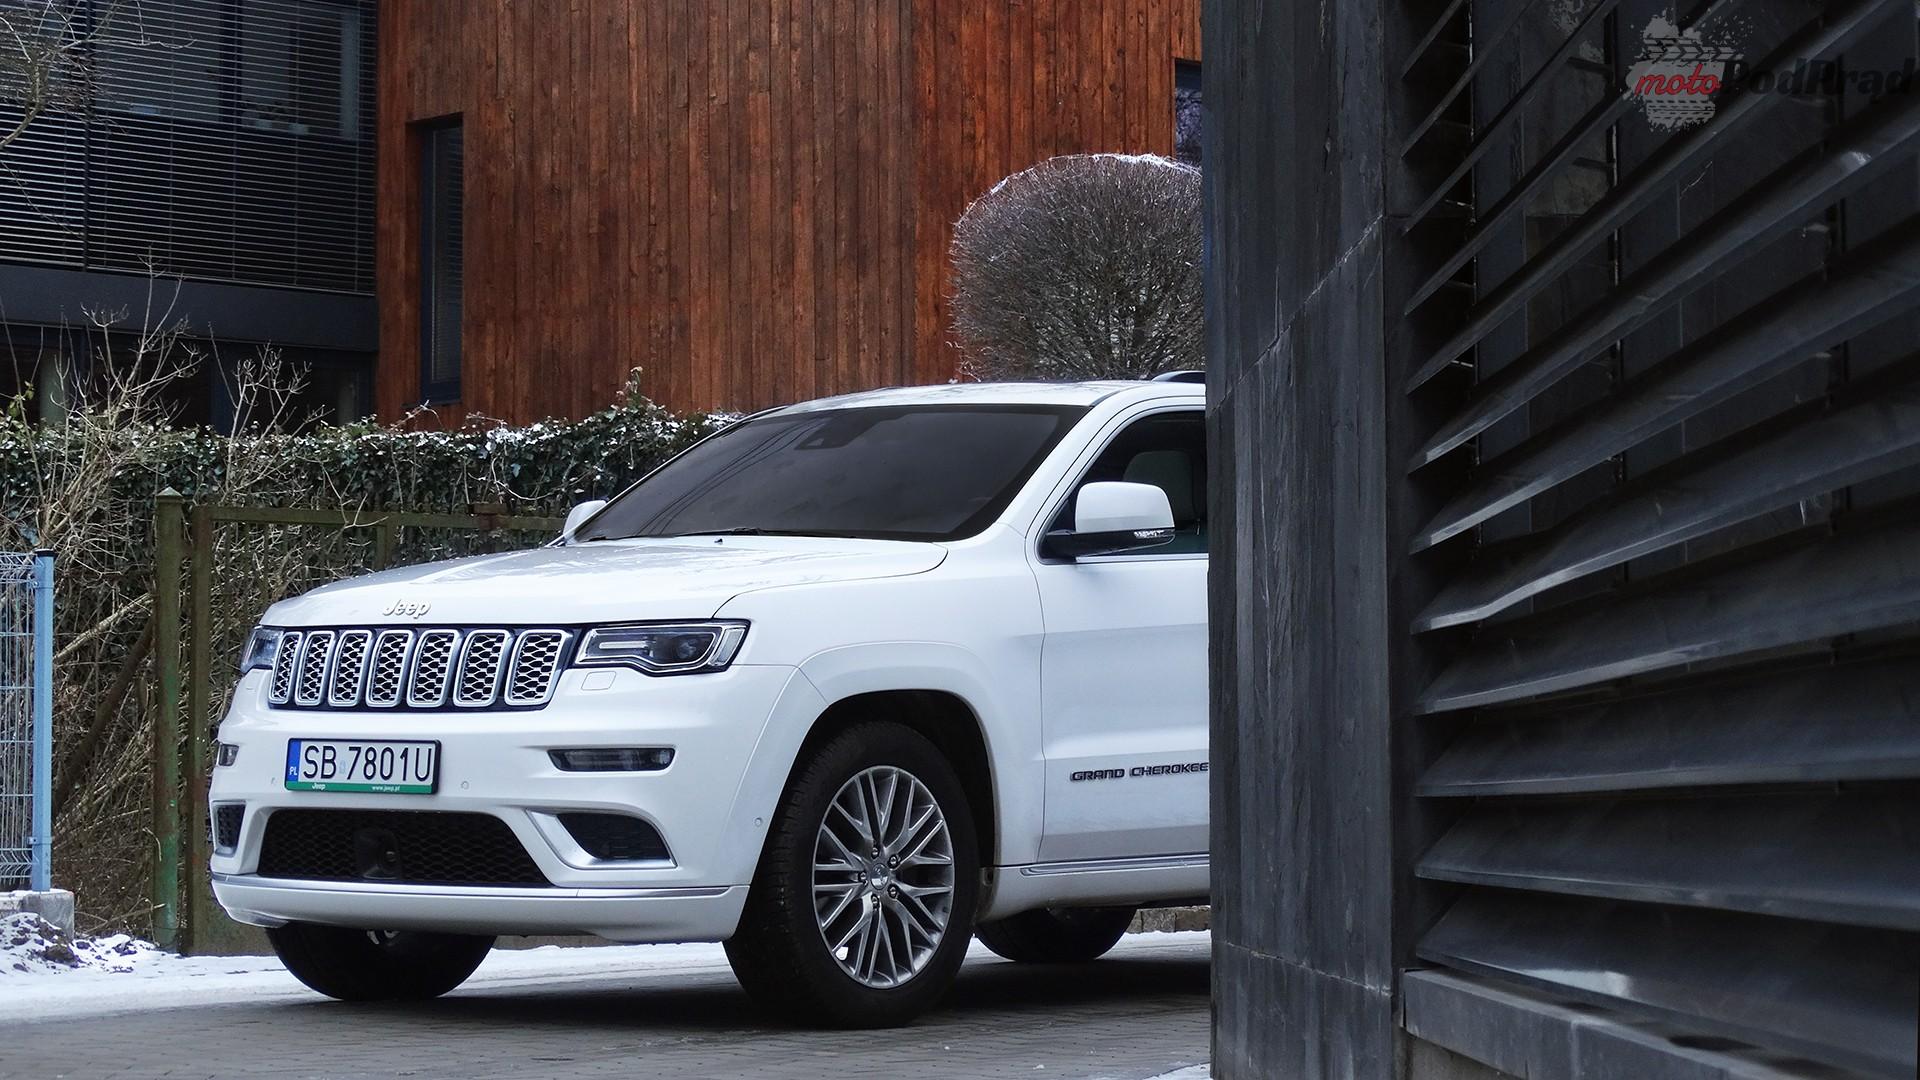 jeep grand cherokee 12 Porównanie: SsangYong Rexton G4 2.2d kontra Jeep Grand Cherokee 3.0 CRD